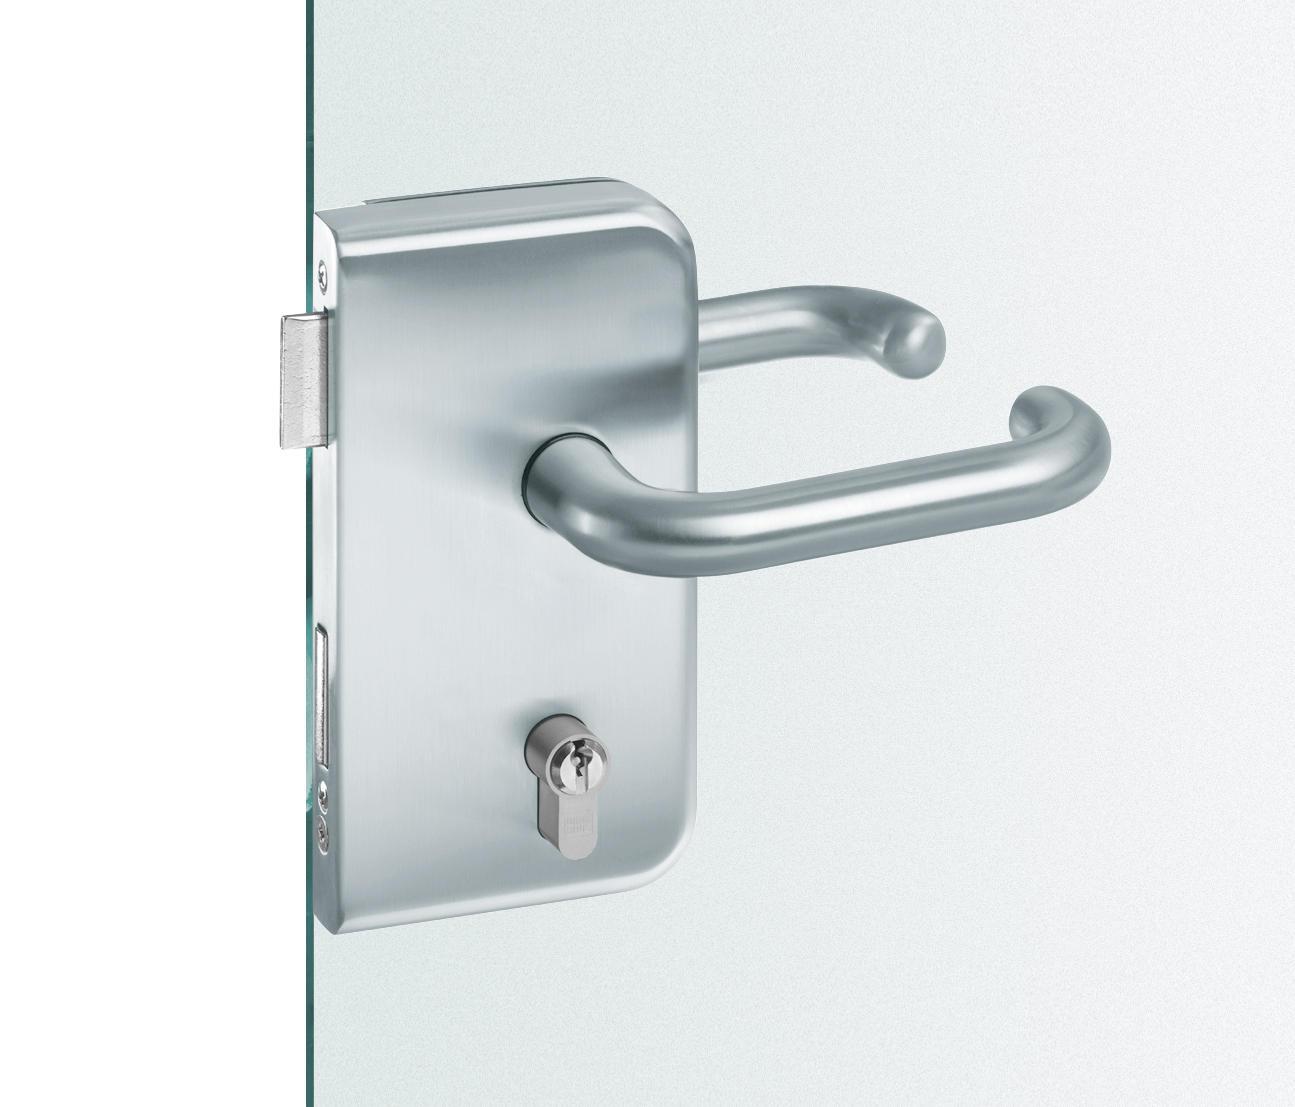 fsb 13 4223 glass door fitting handle sets for glass. Black Bedroom Furniture Sets. Home Design Ideas